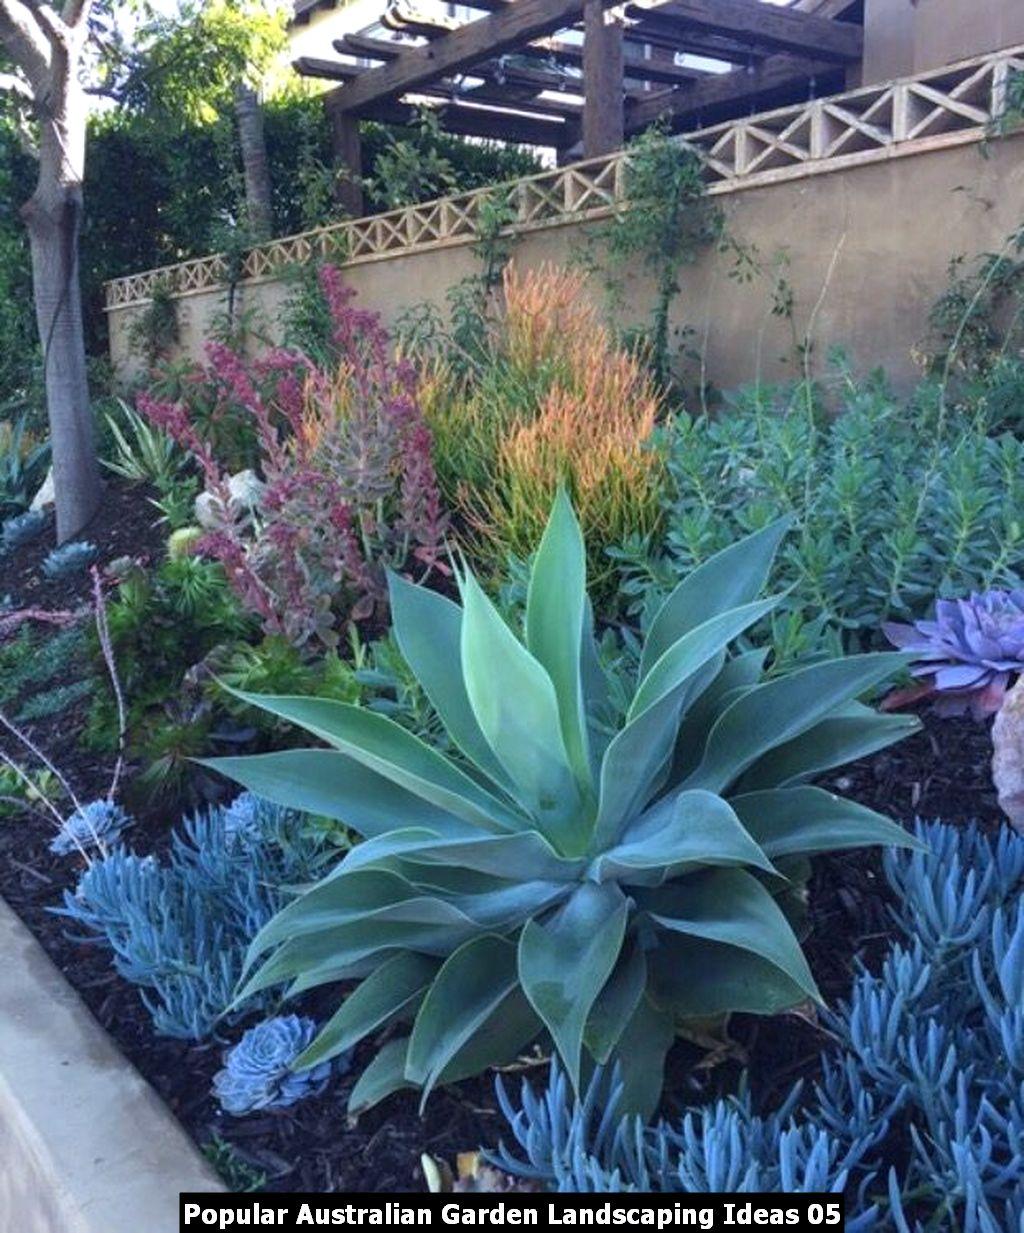 Popular Australian Garden Landscaping Ideas 05